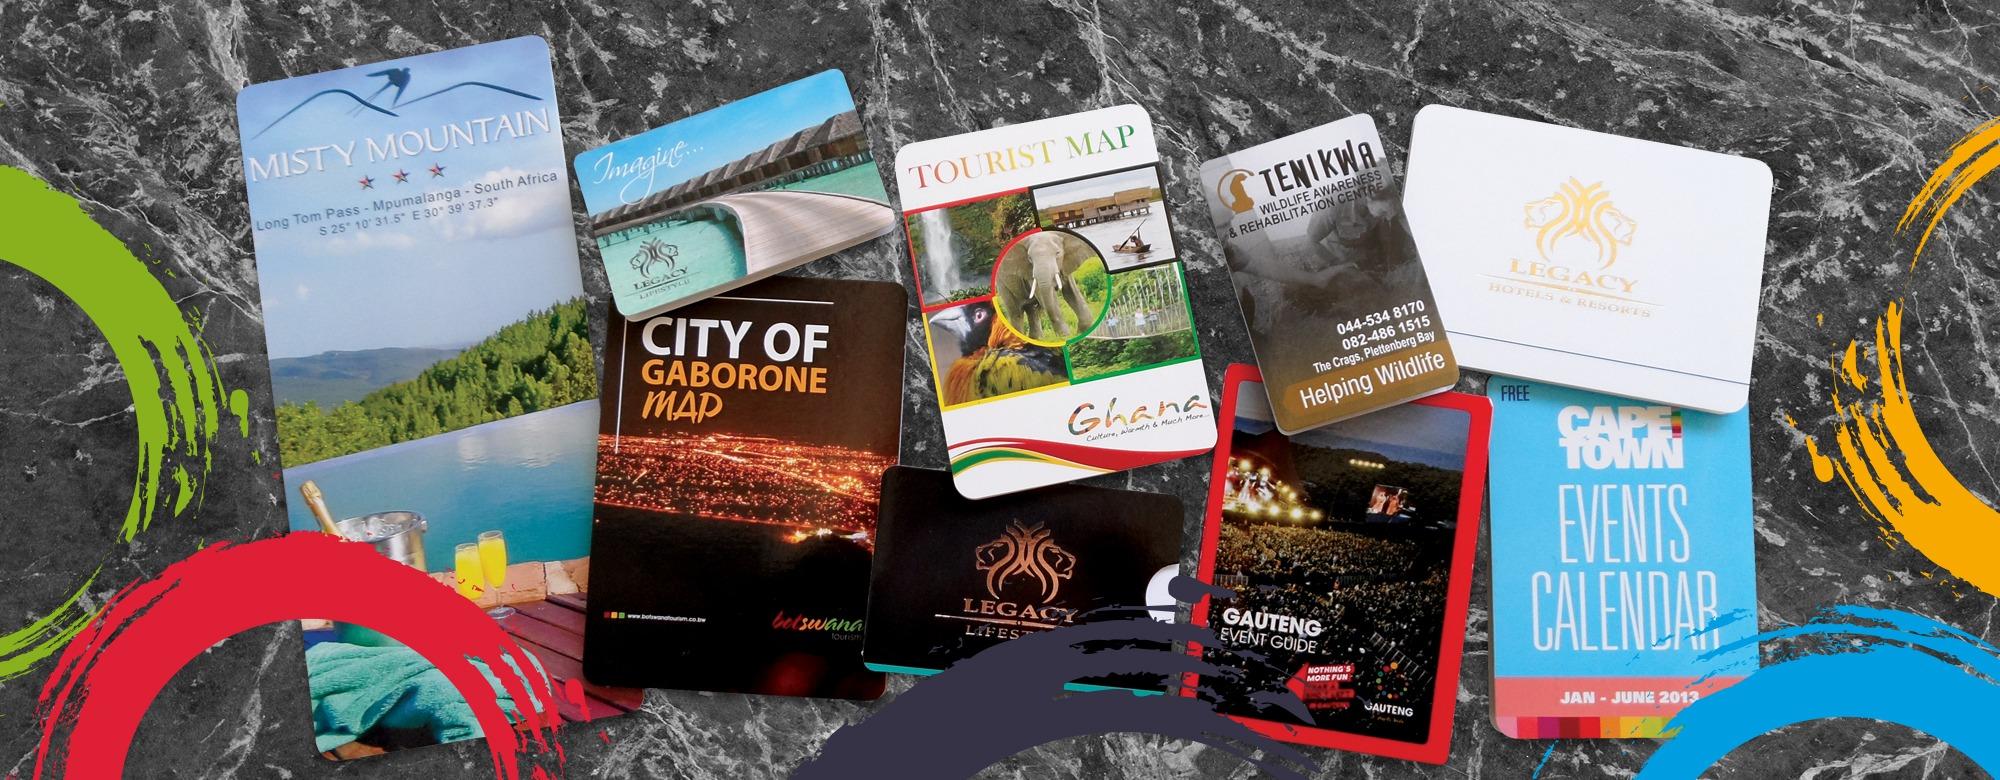 pocketmedia-for-tourism-marketing